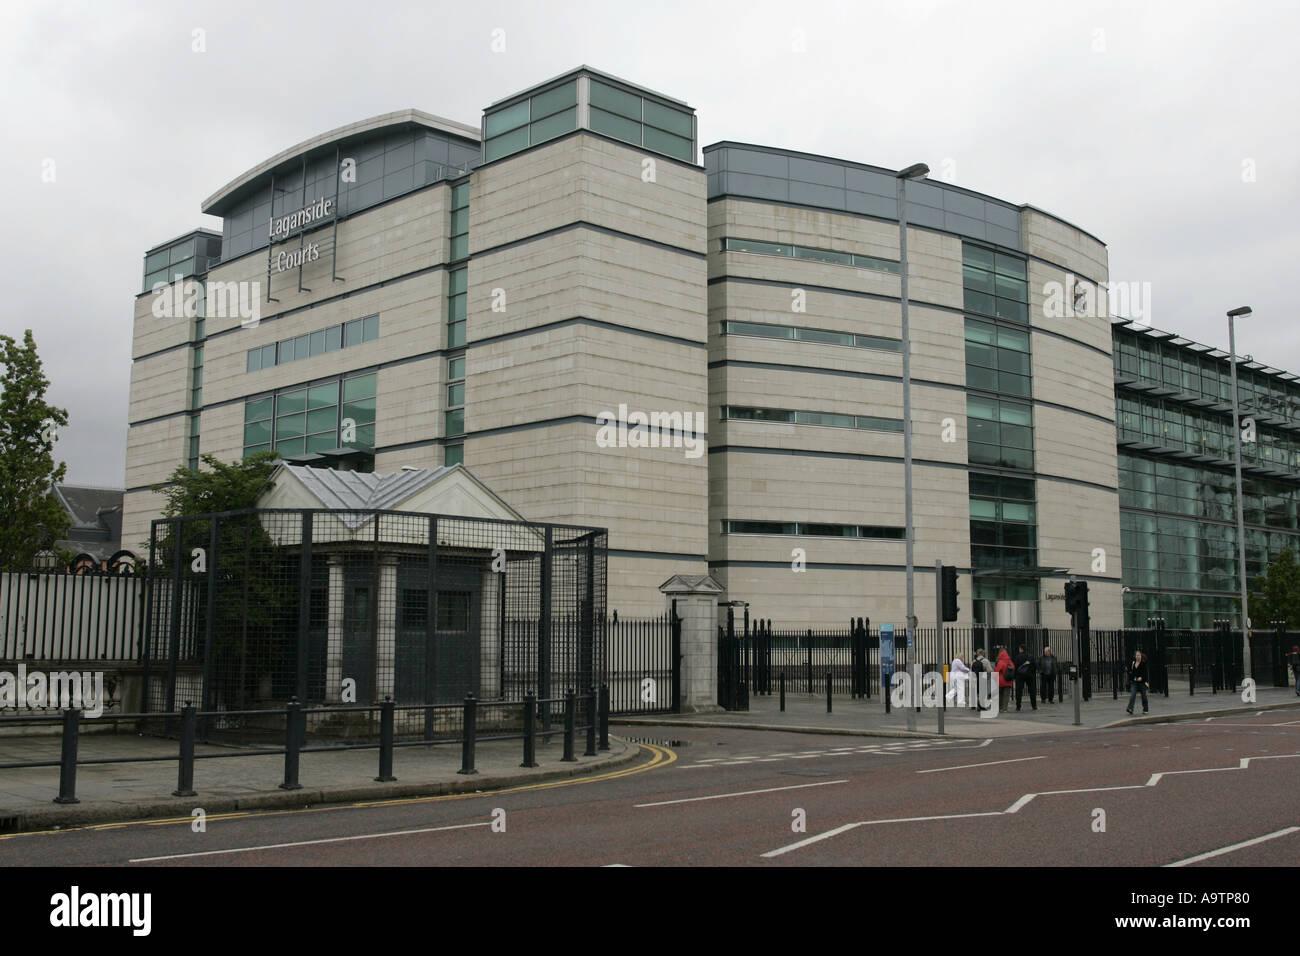 Laganside Courts Belfast - Stock Image